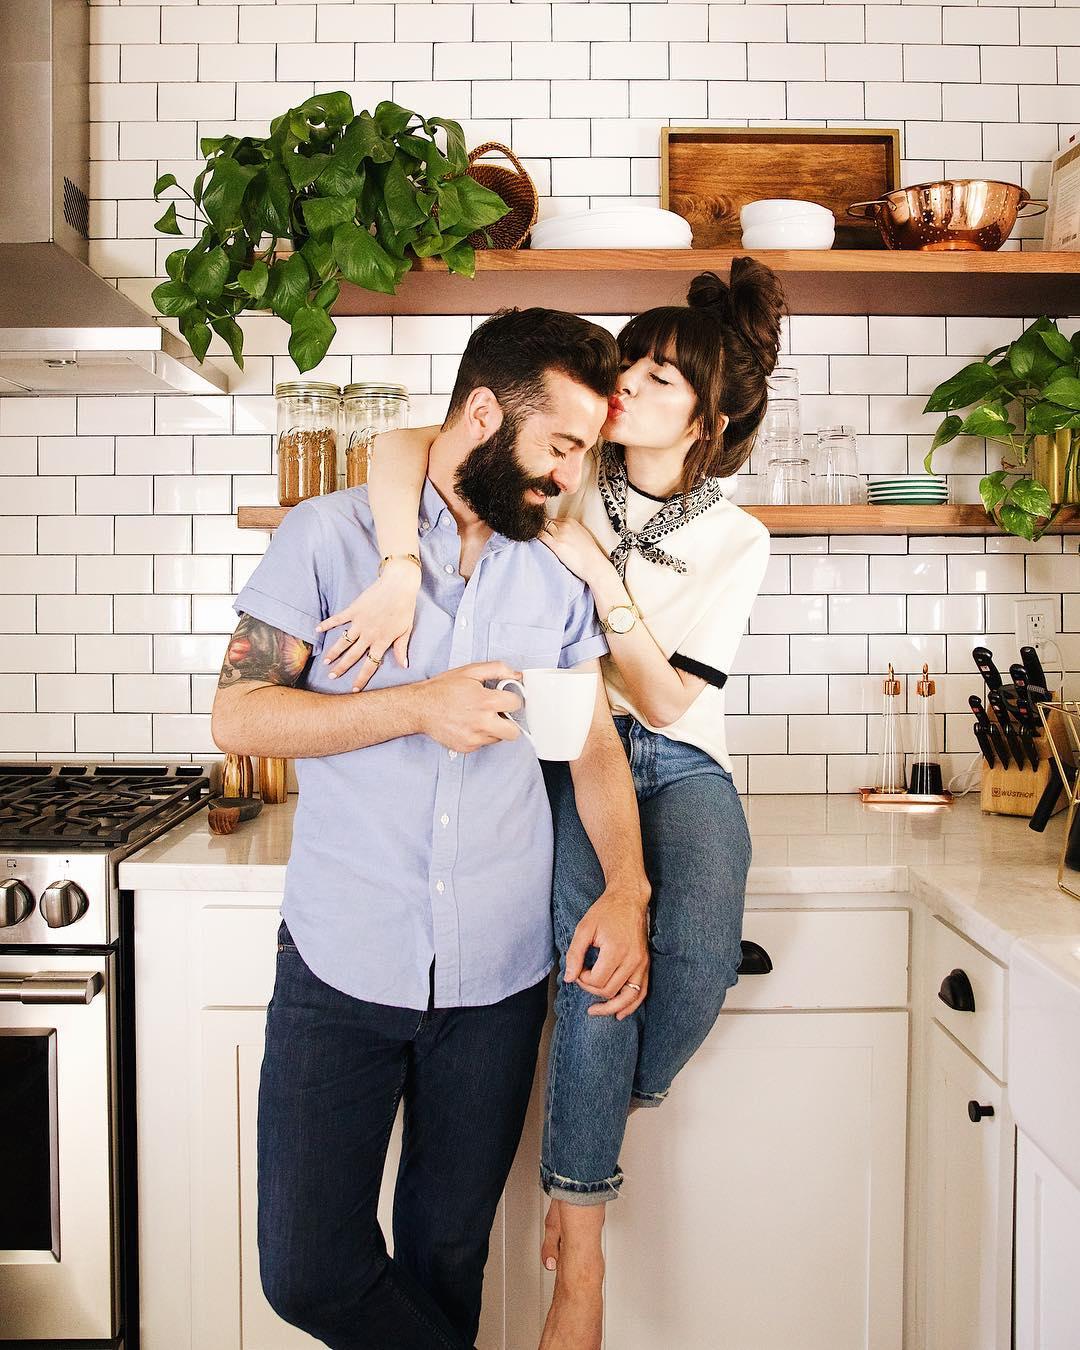 newdarling cooking together